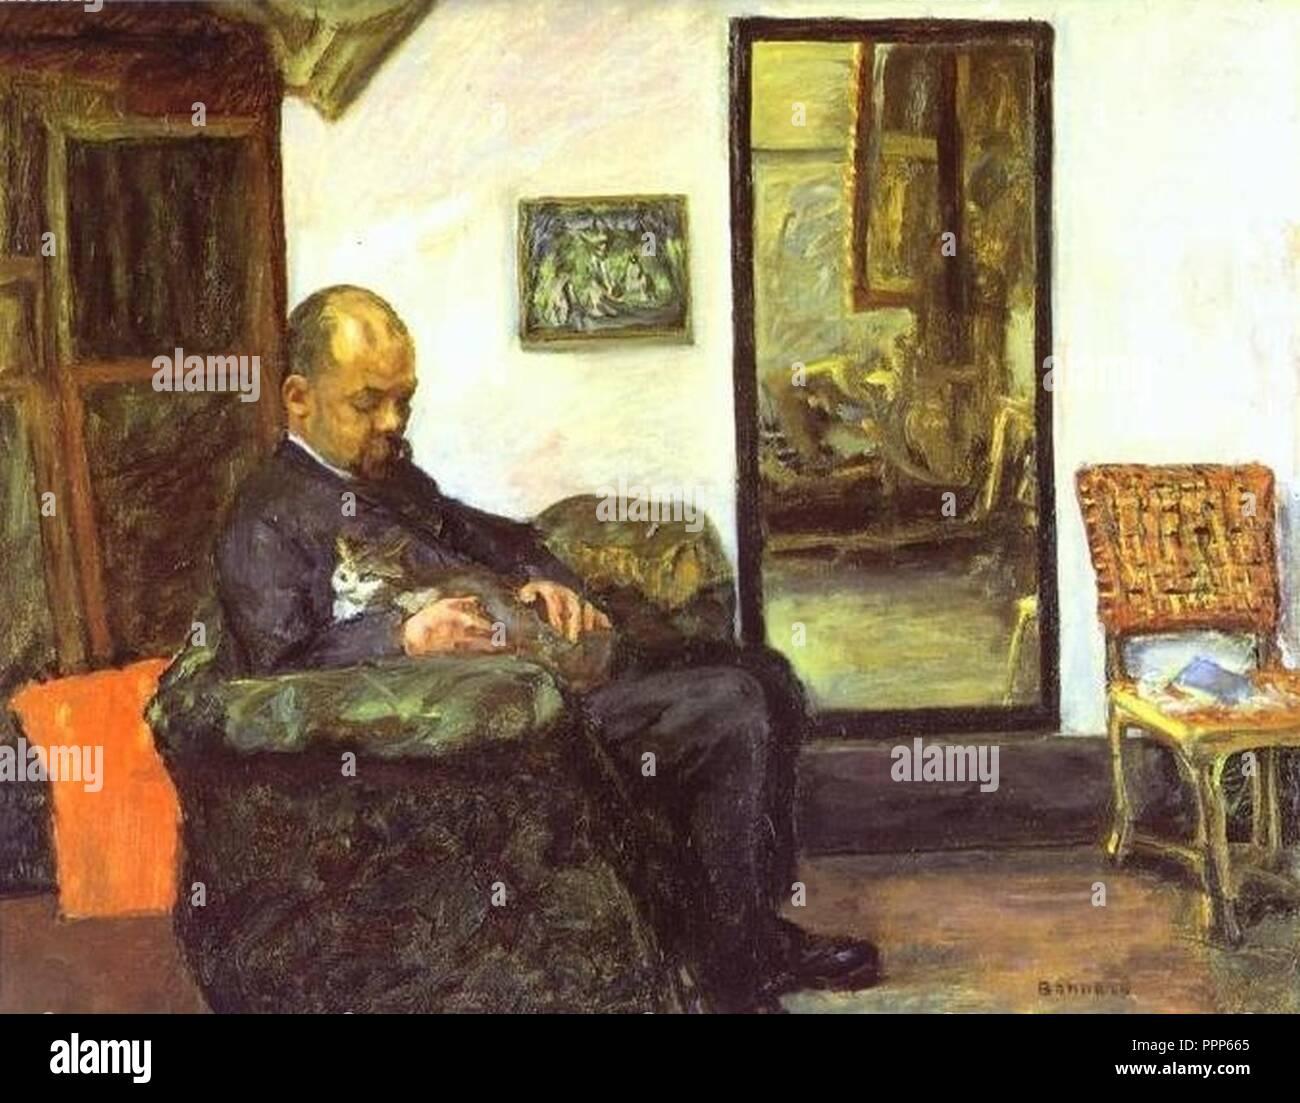 Pierre Bonnard 1904 - Ambroise Vollard. - Stock Image